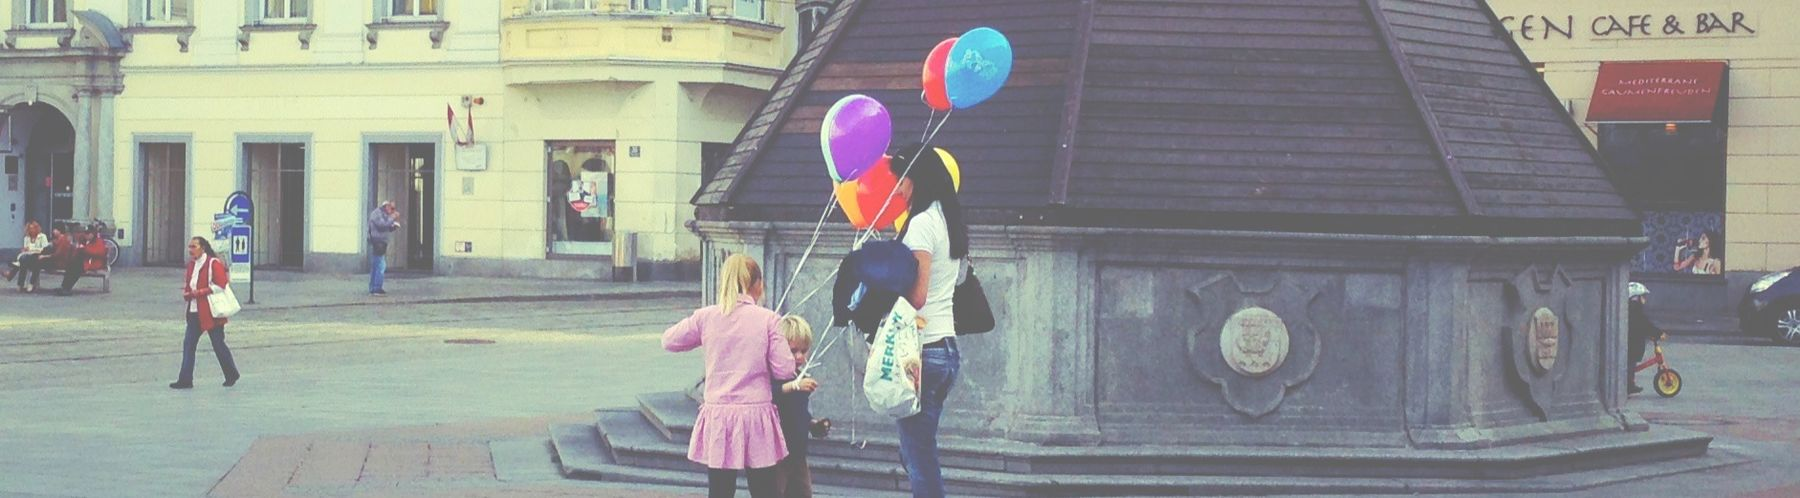 People Watching Streetphotography Baloons Justgoshoot